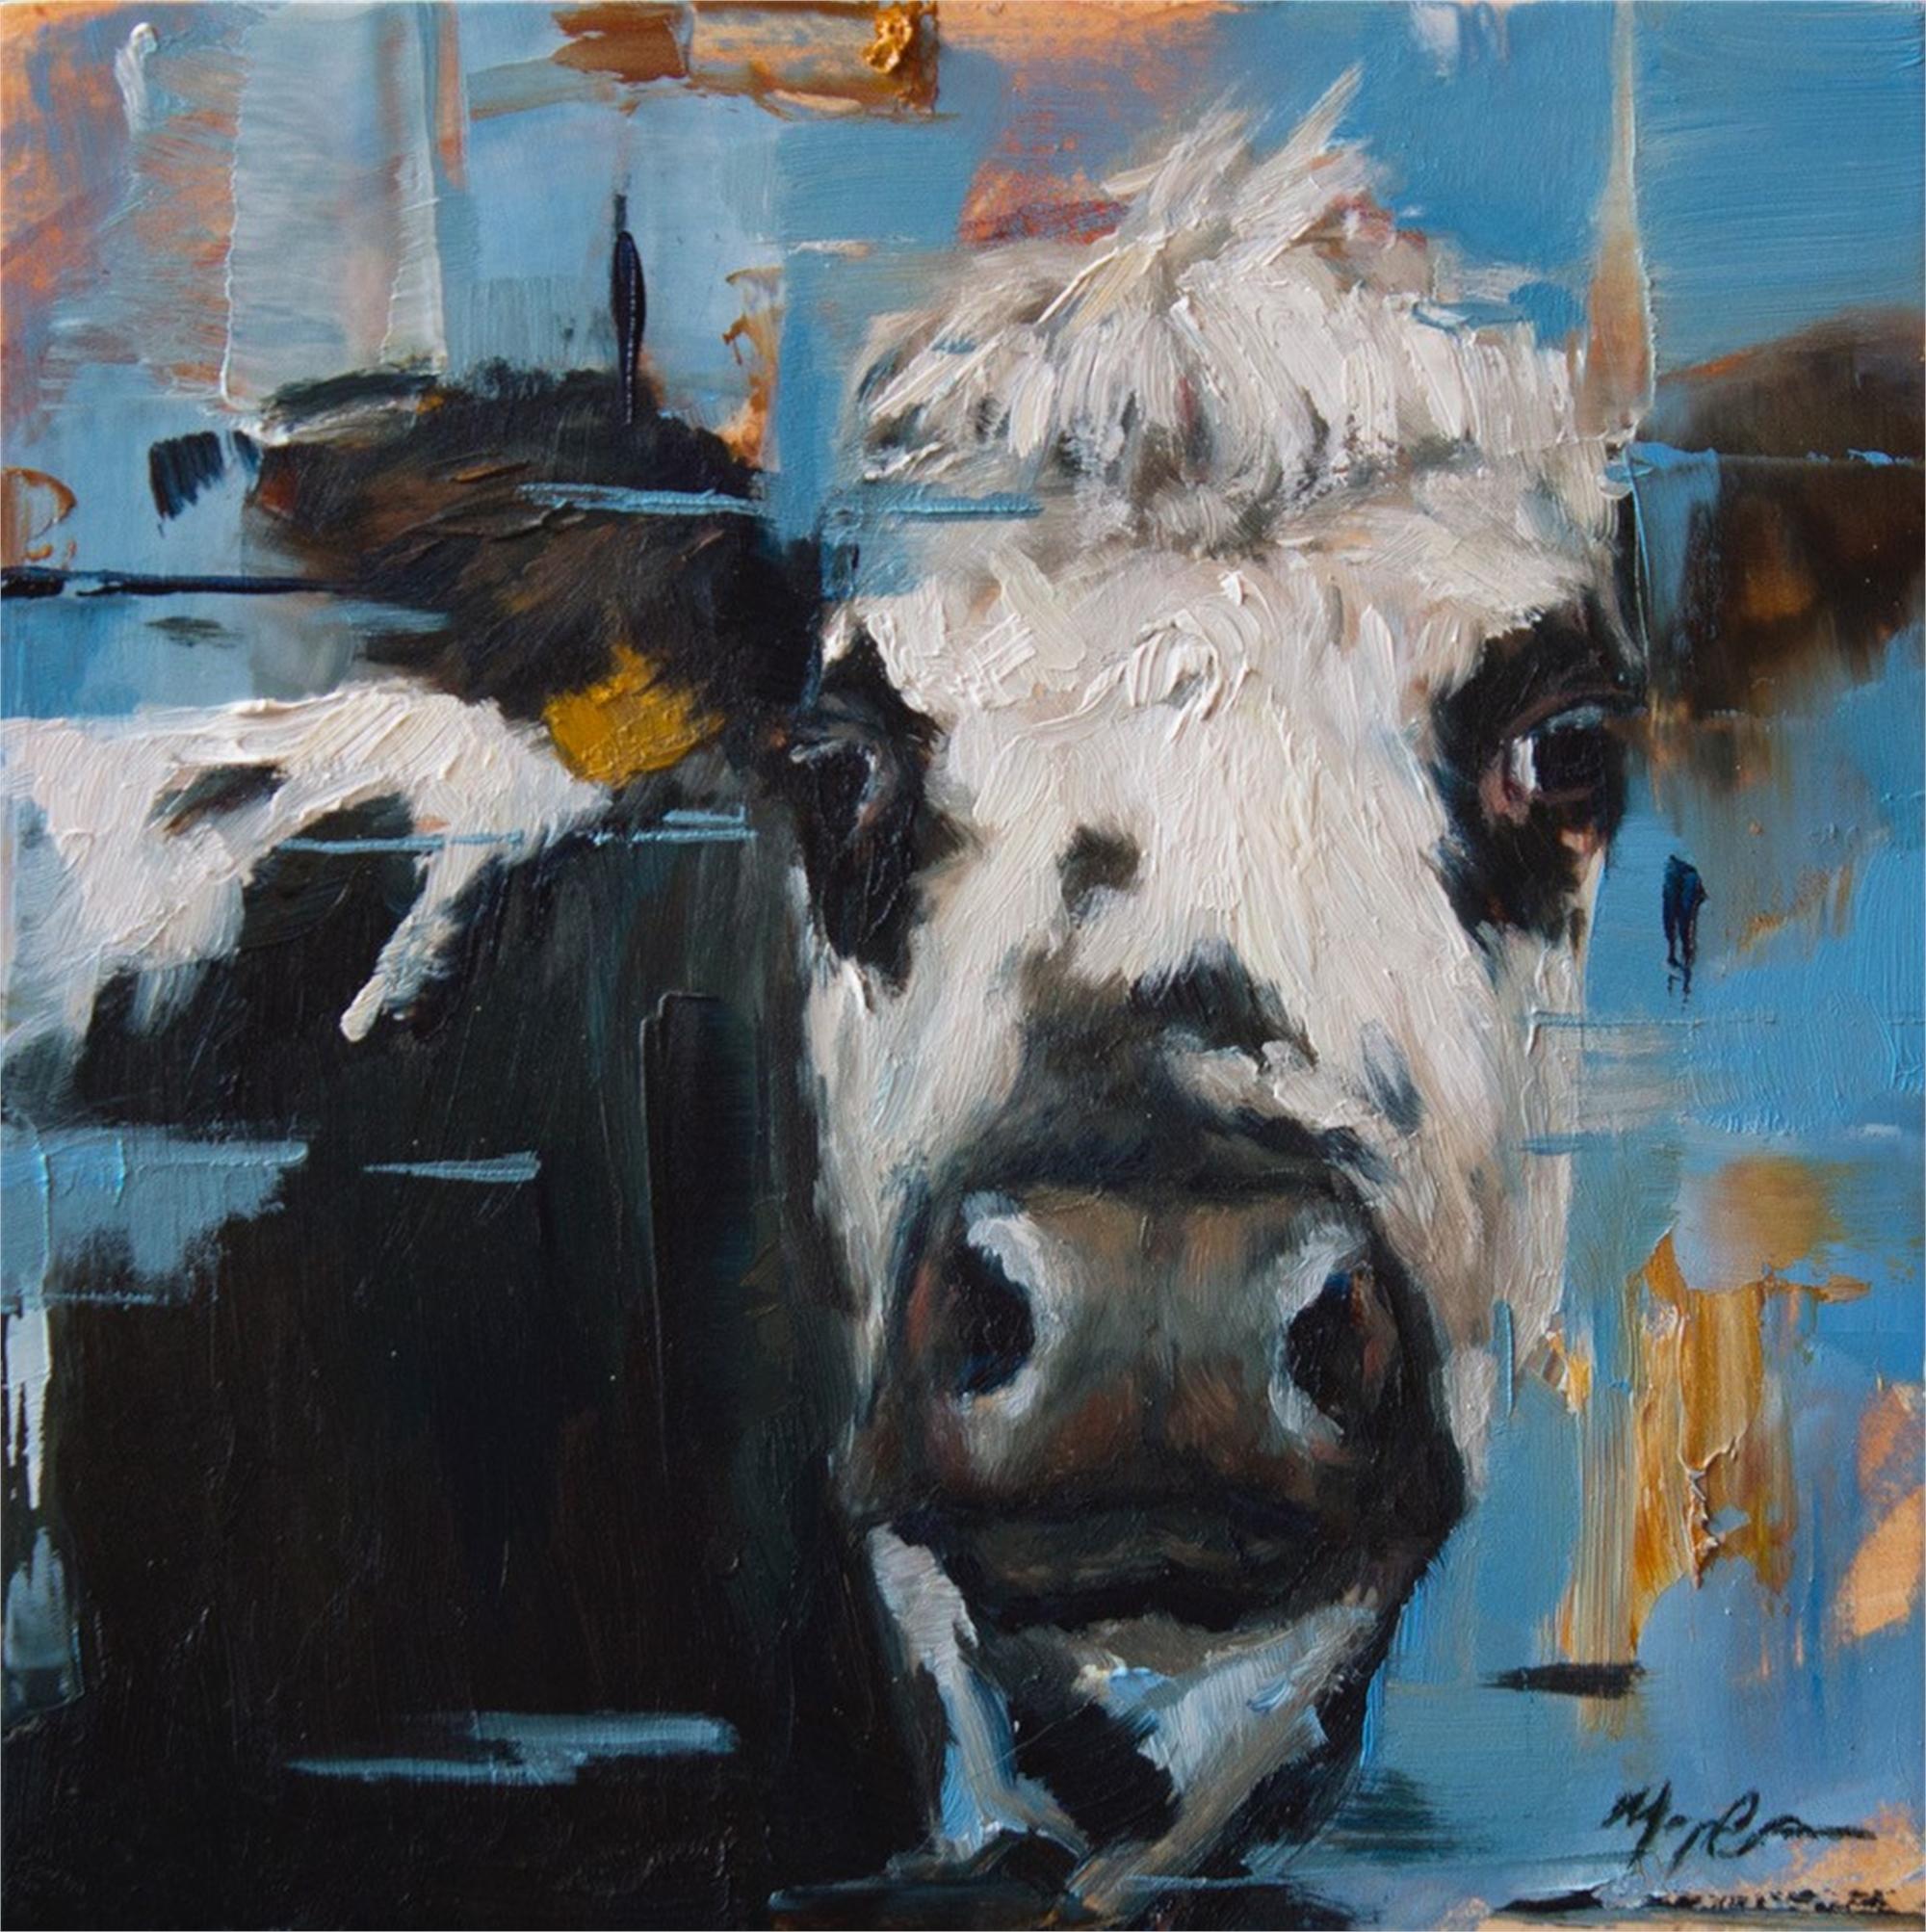 Blue Cow Portrait by Morgan Cameron